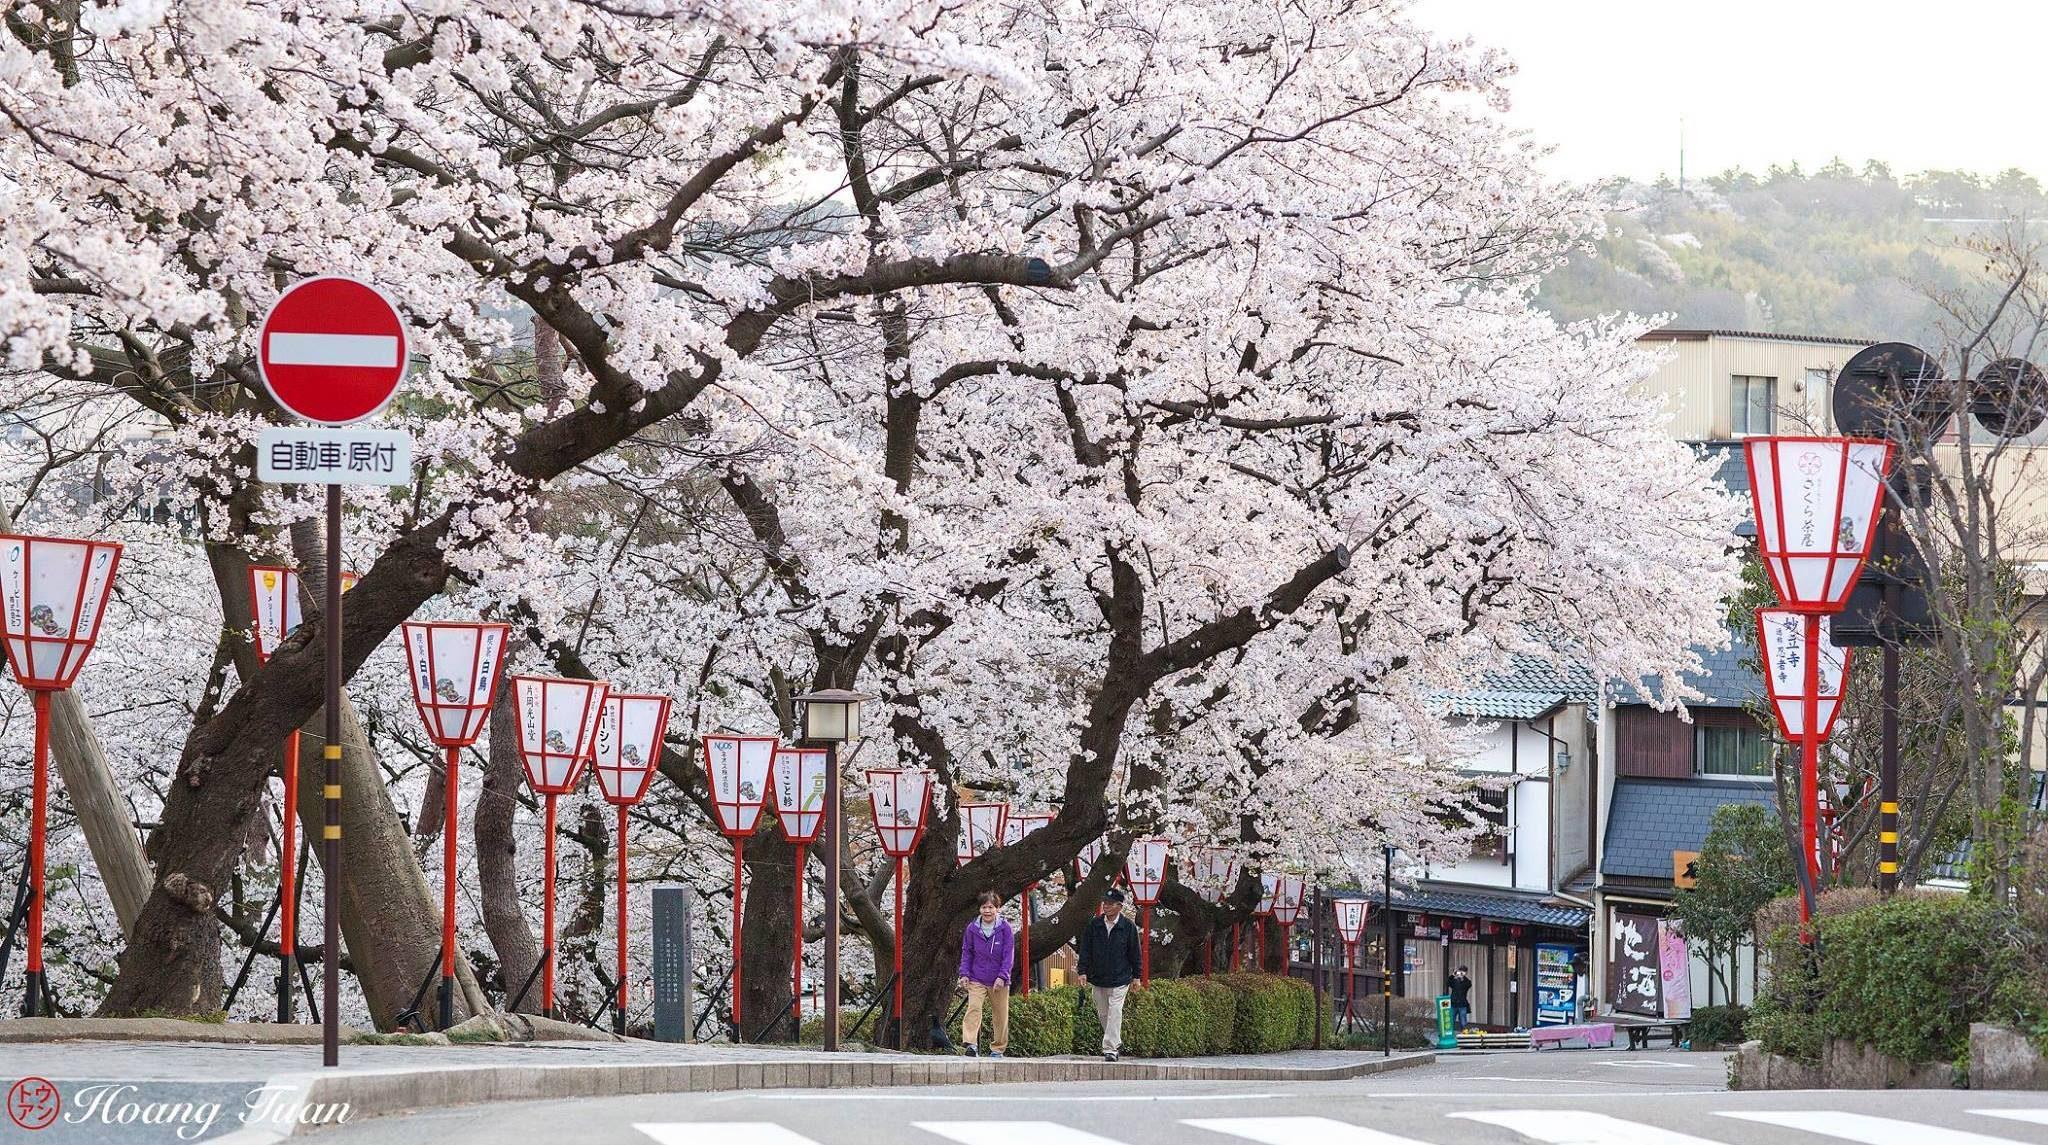 Hoang Anh Tuan – Sakura Blooming in front of Kanazawa Castle